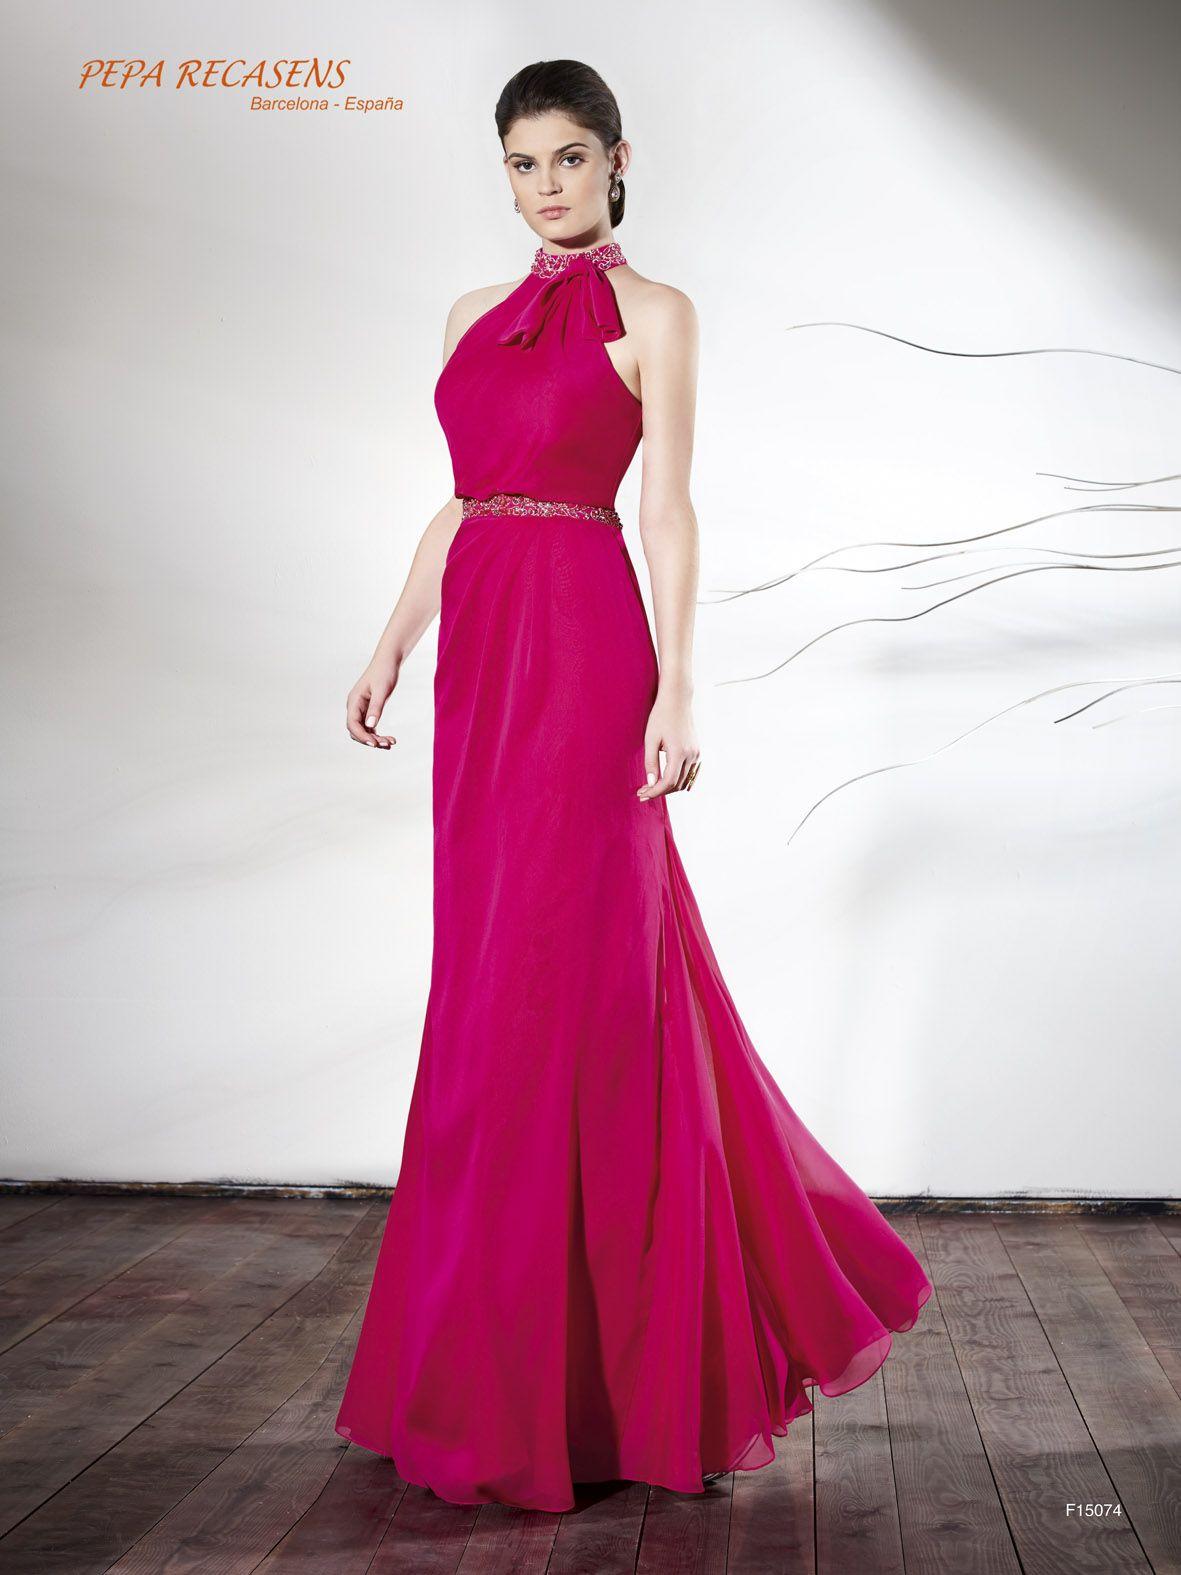 Vestido de fiesta Pepa Recasens modelo F15074